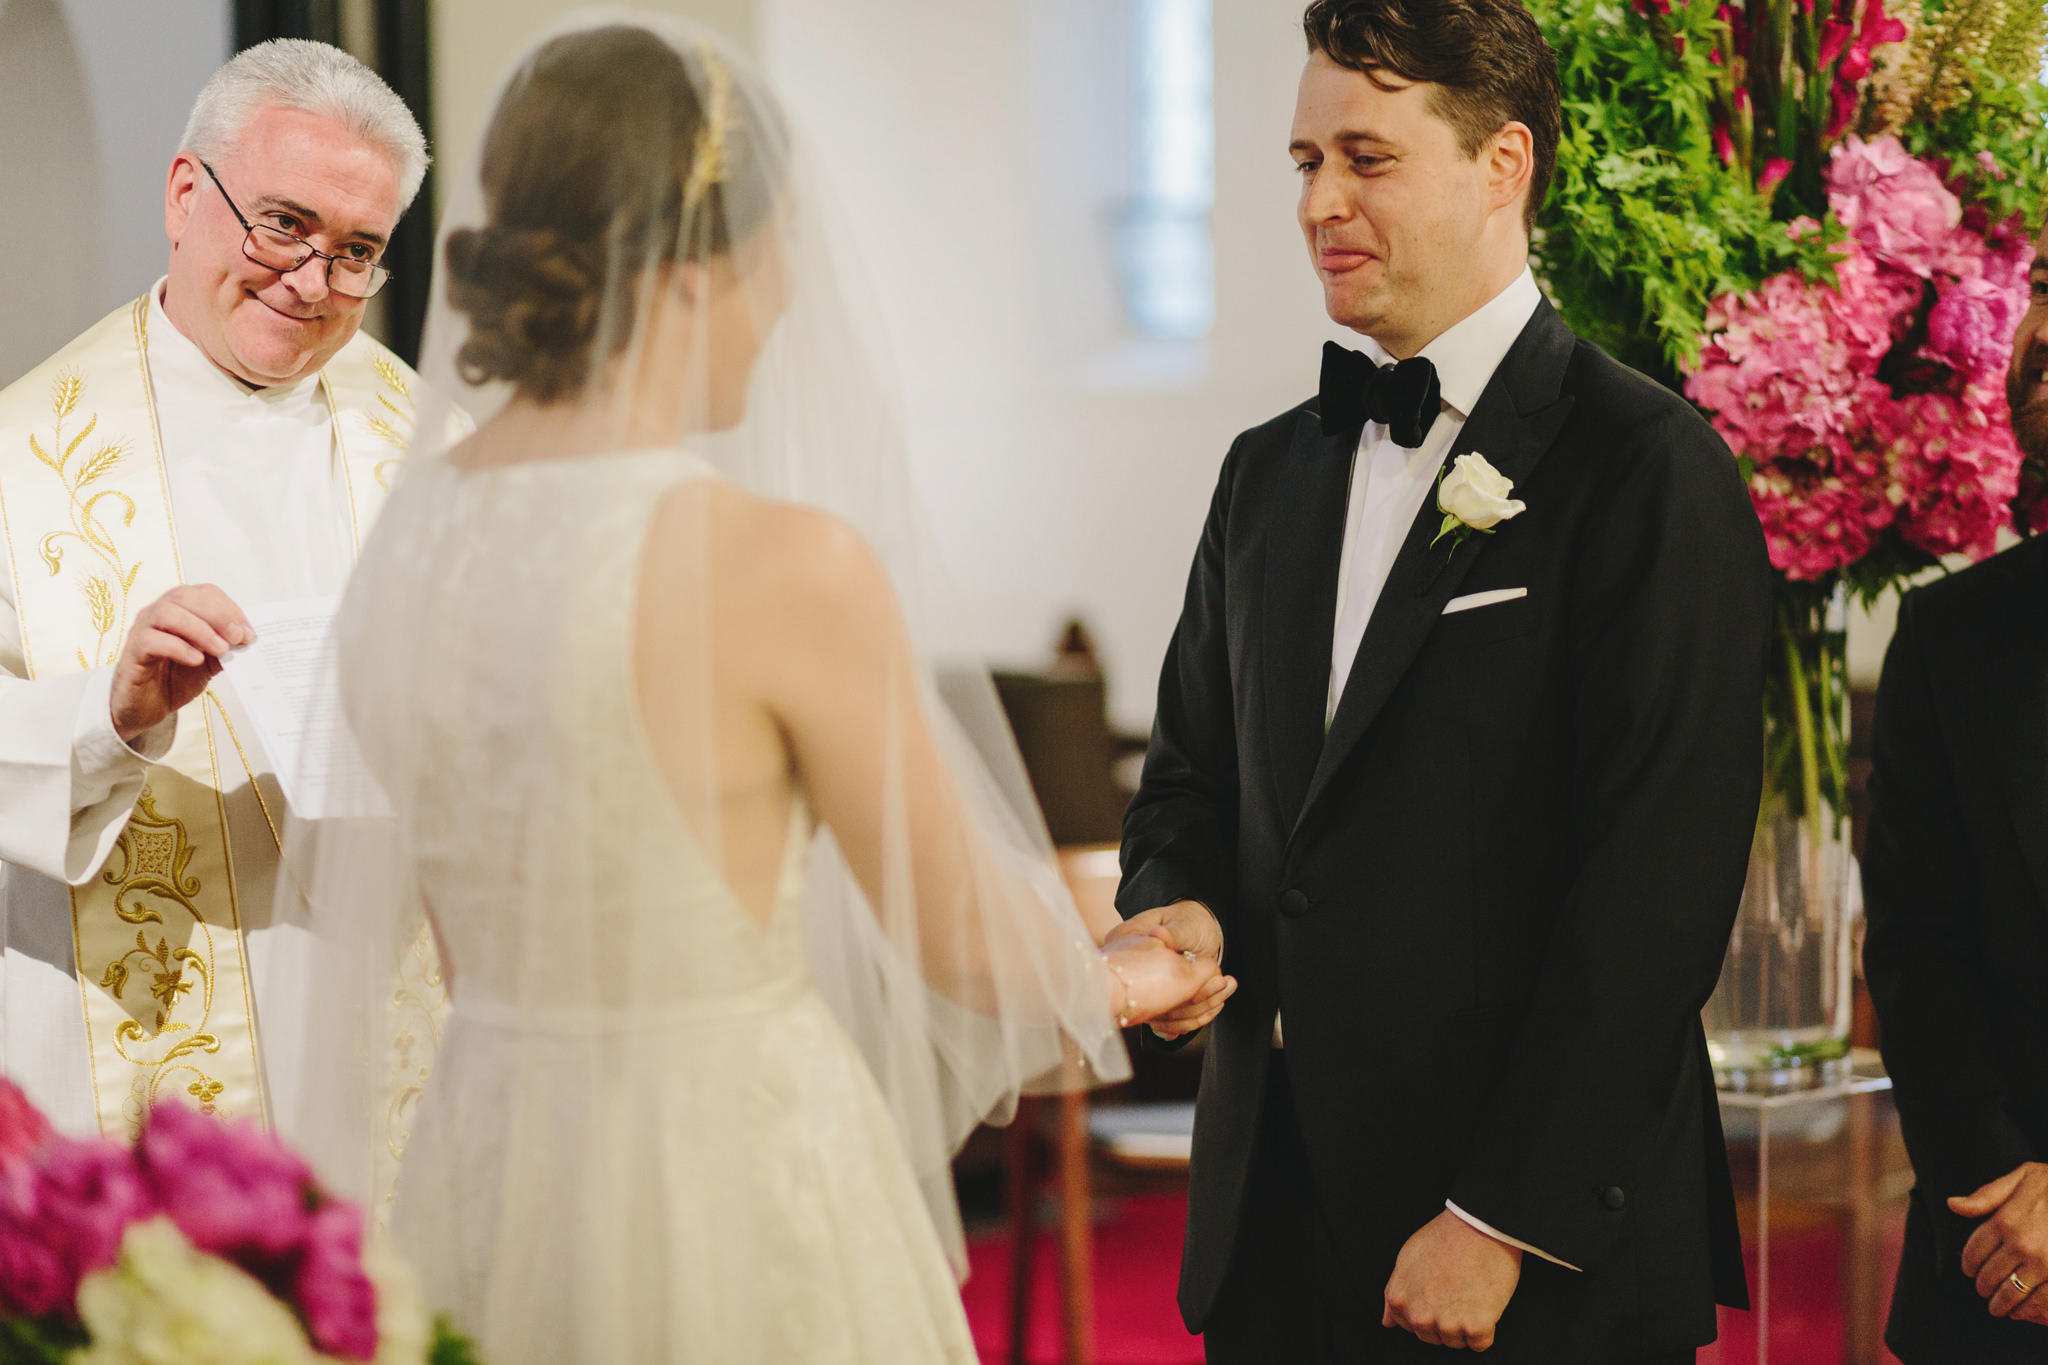 Abbotsford_Convent_Wedding_Peter_Anna057.JPG